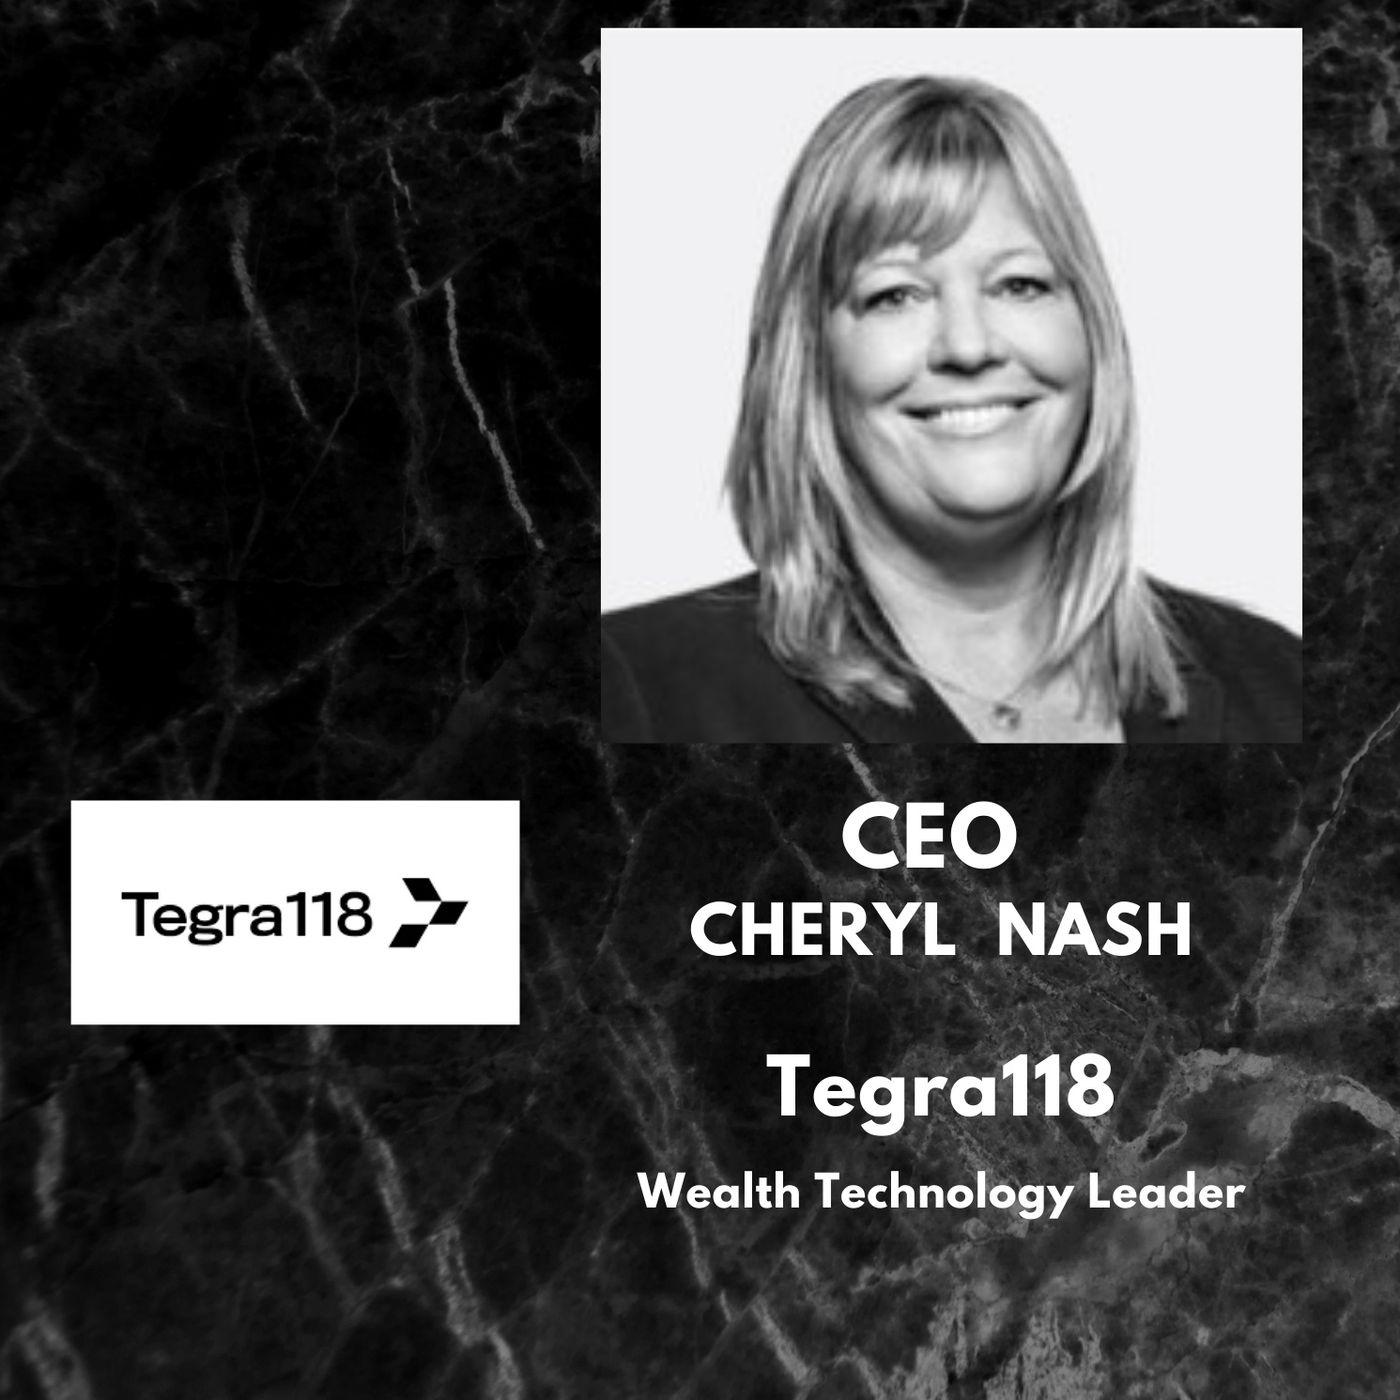 2021 Planning: Tegra118 CEO Cheryl Nash